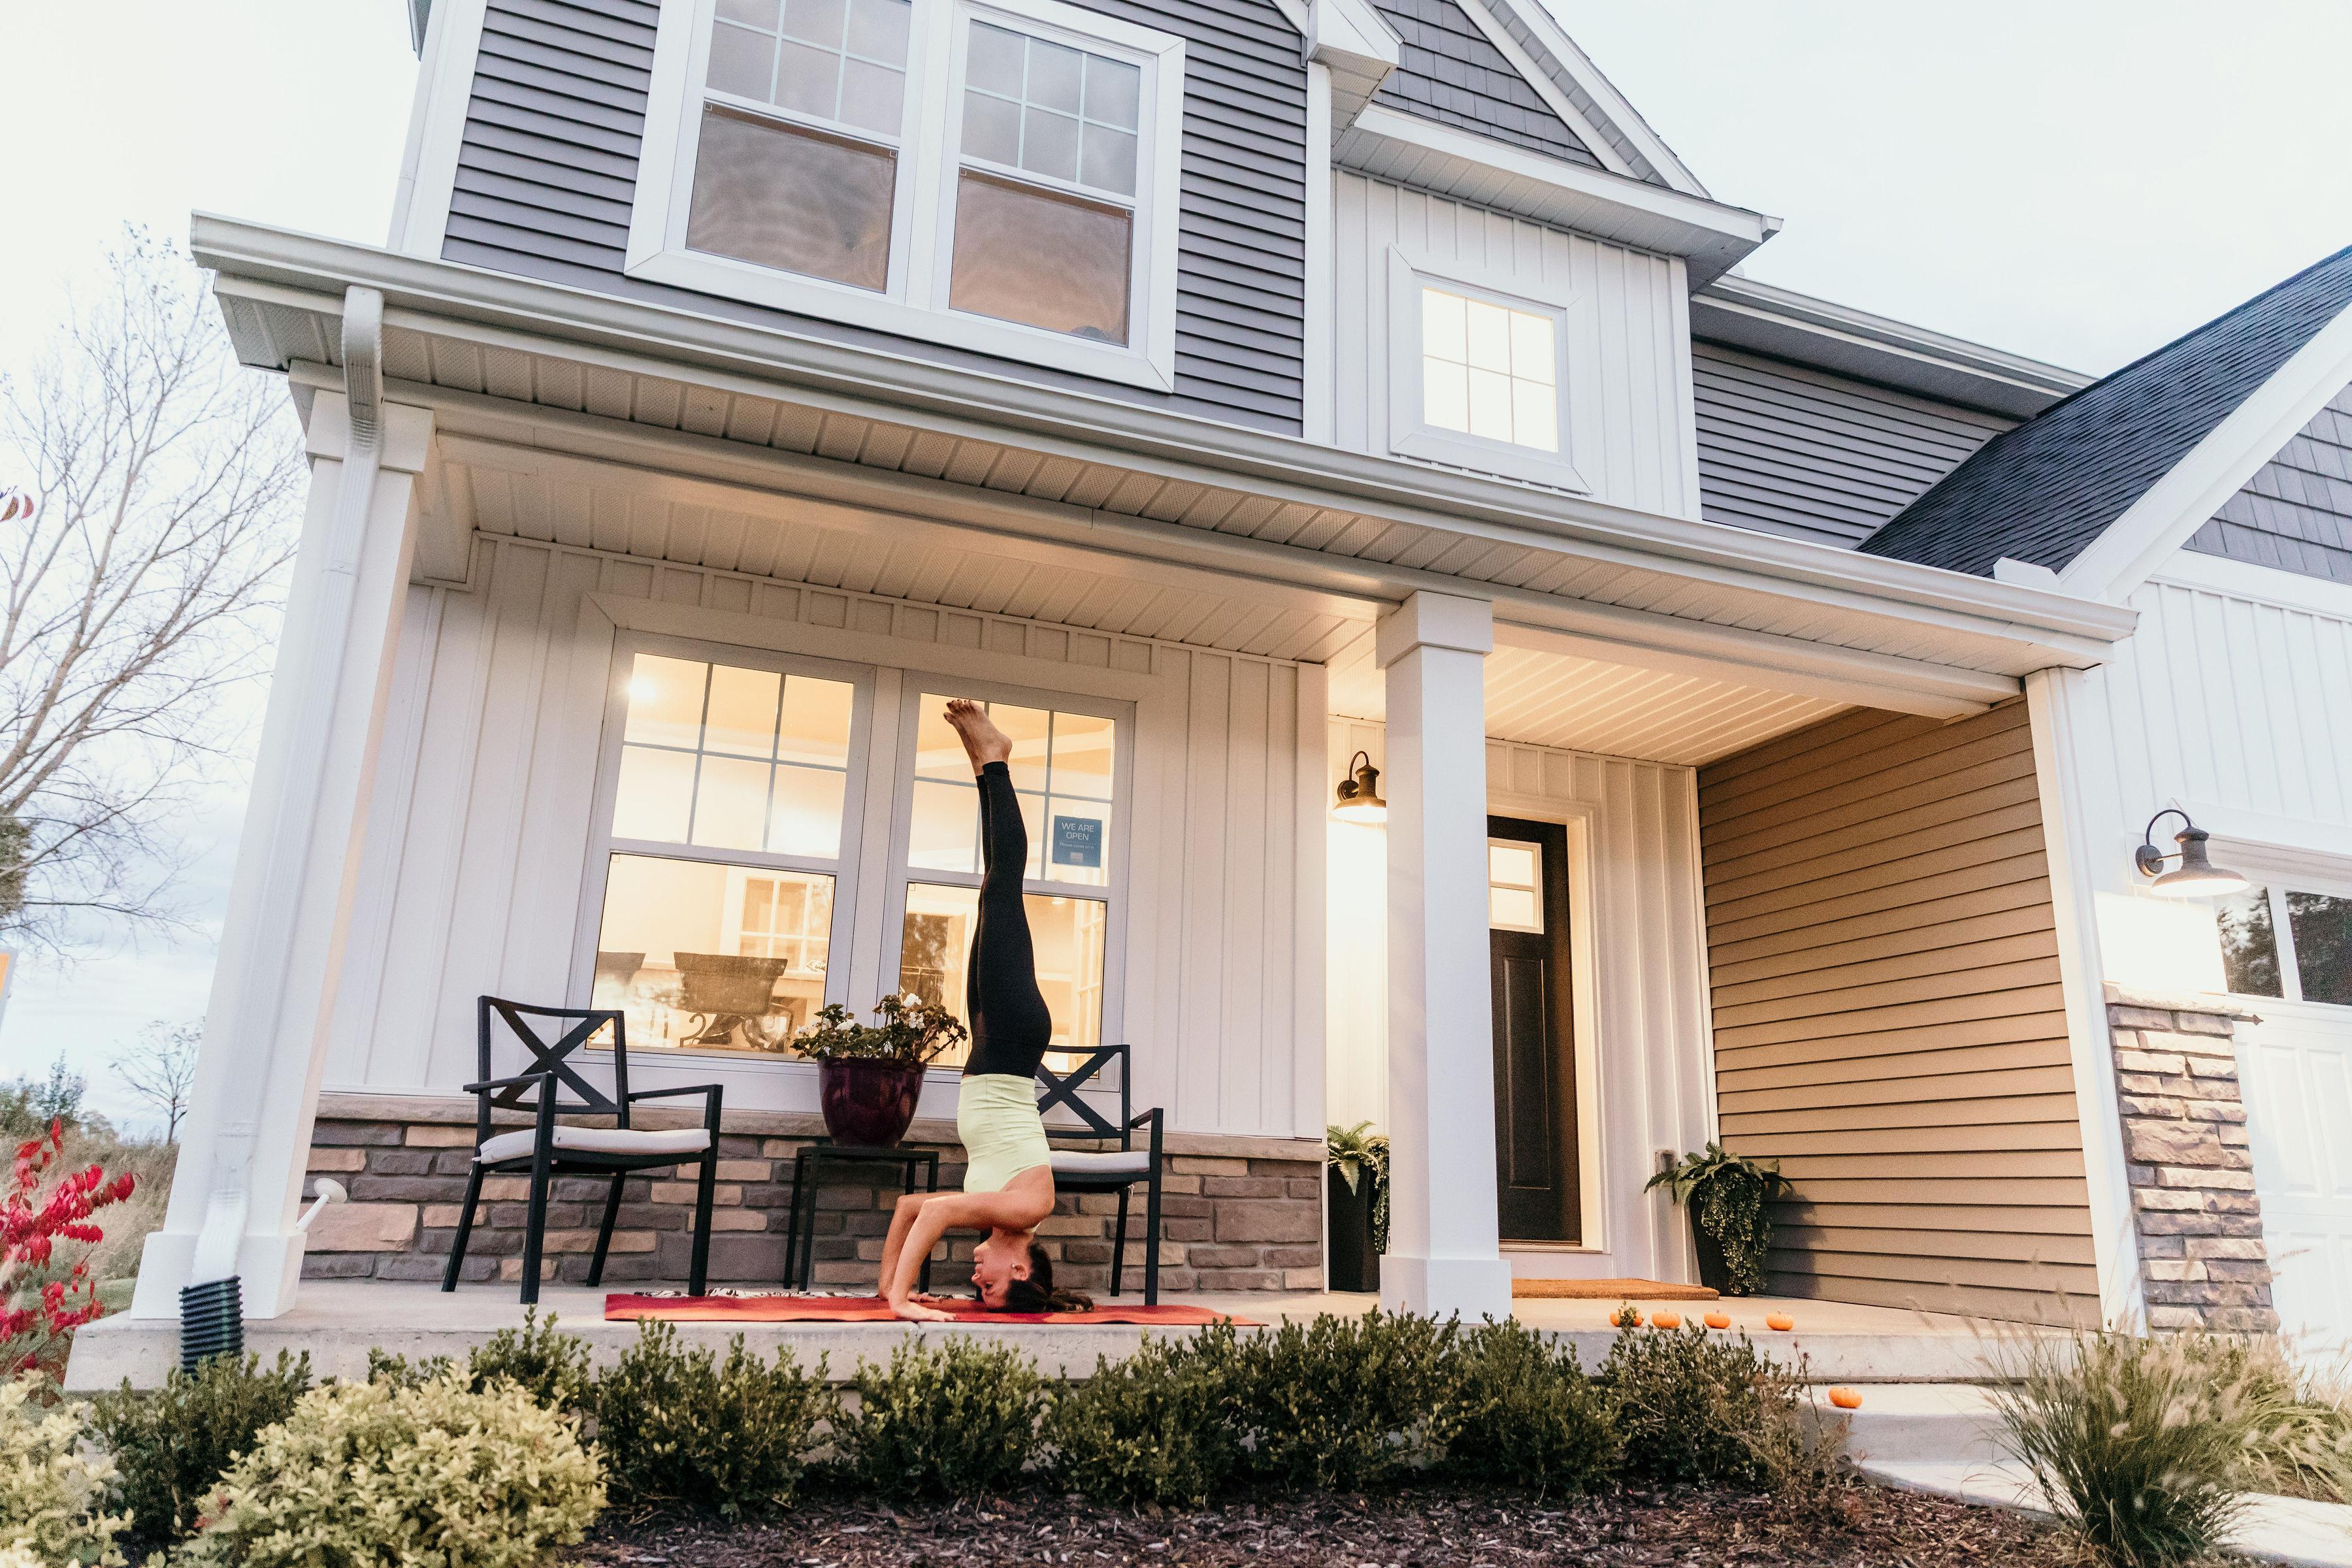 'Arborwood' by Allen Edwin Homes in Grand Rapids